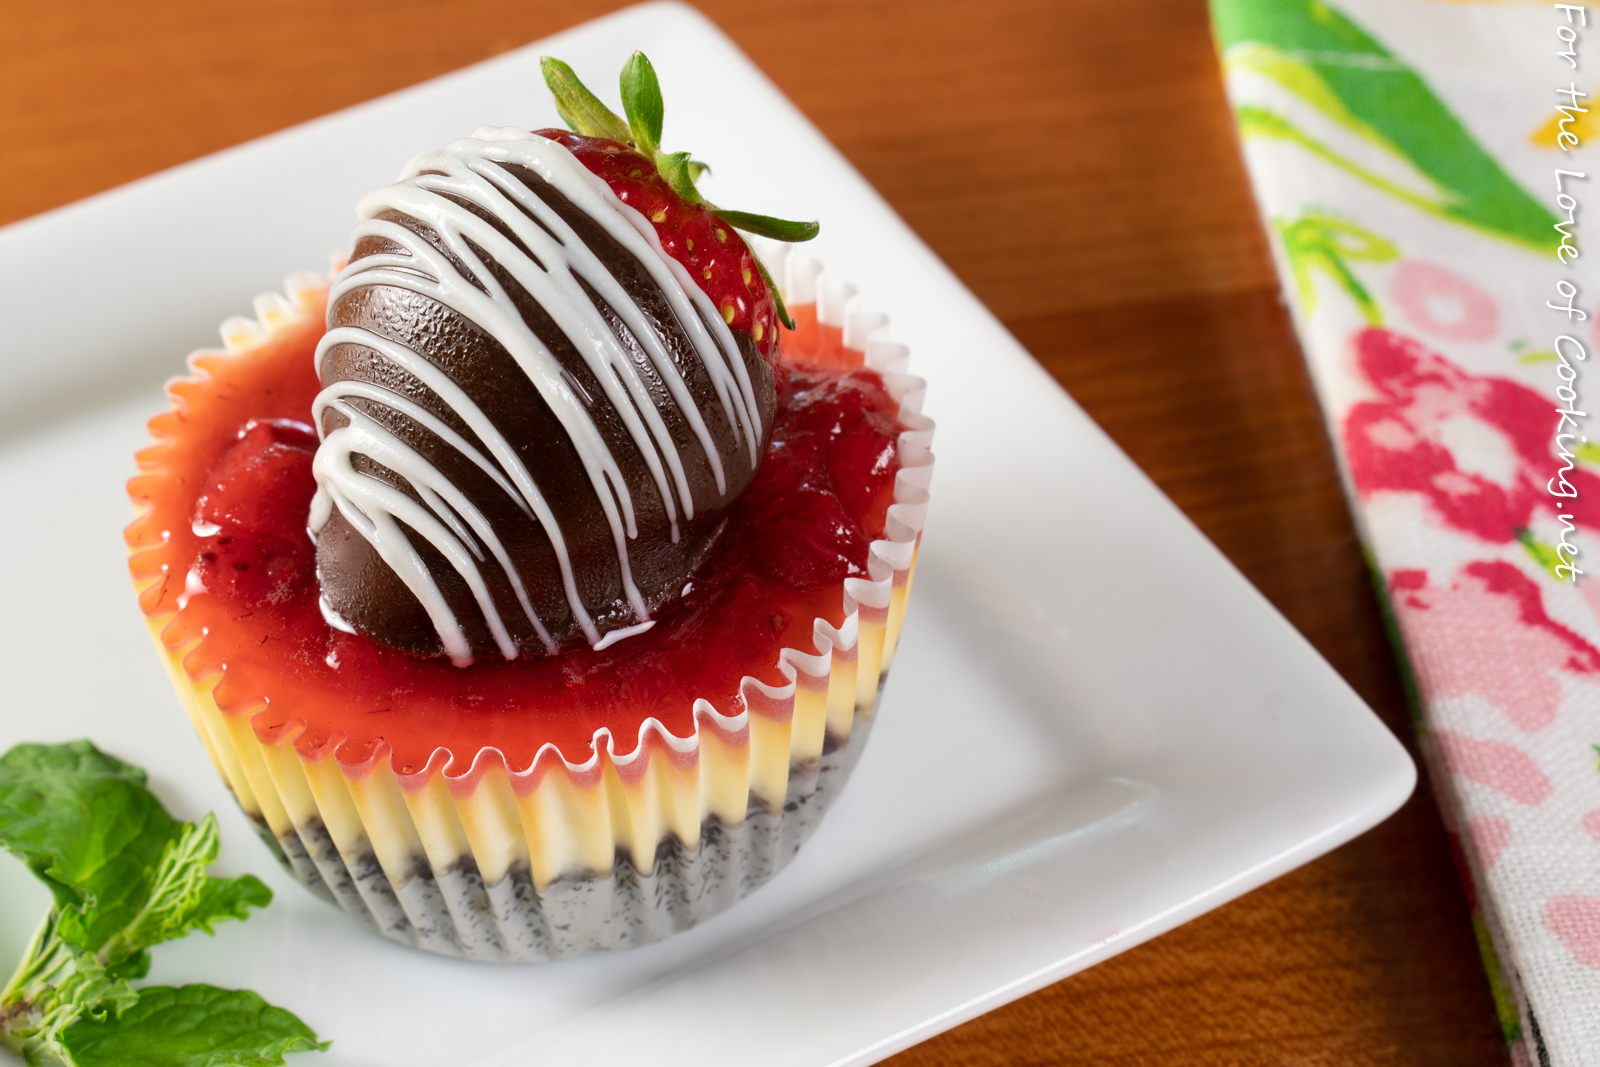 Mini Strawberry Cheesecake with Chocolate Covered Strawberries